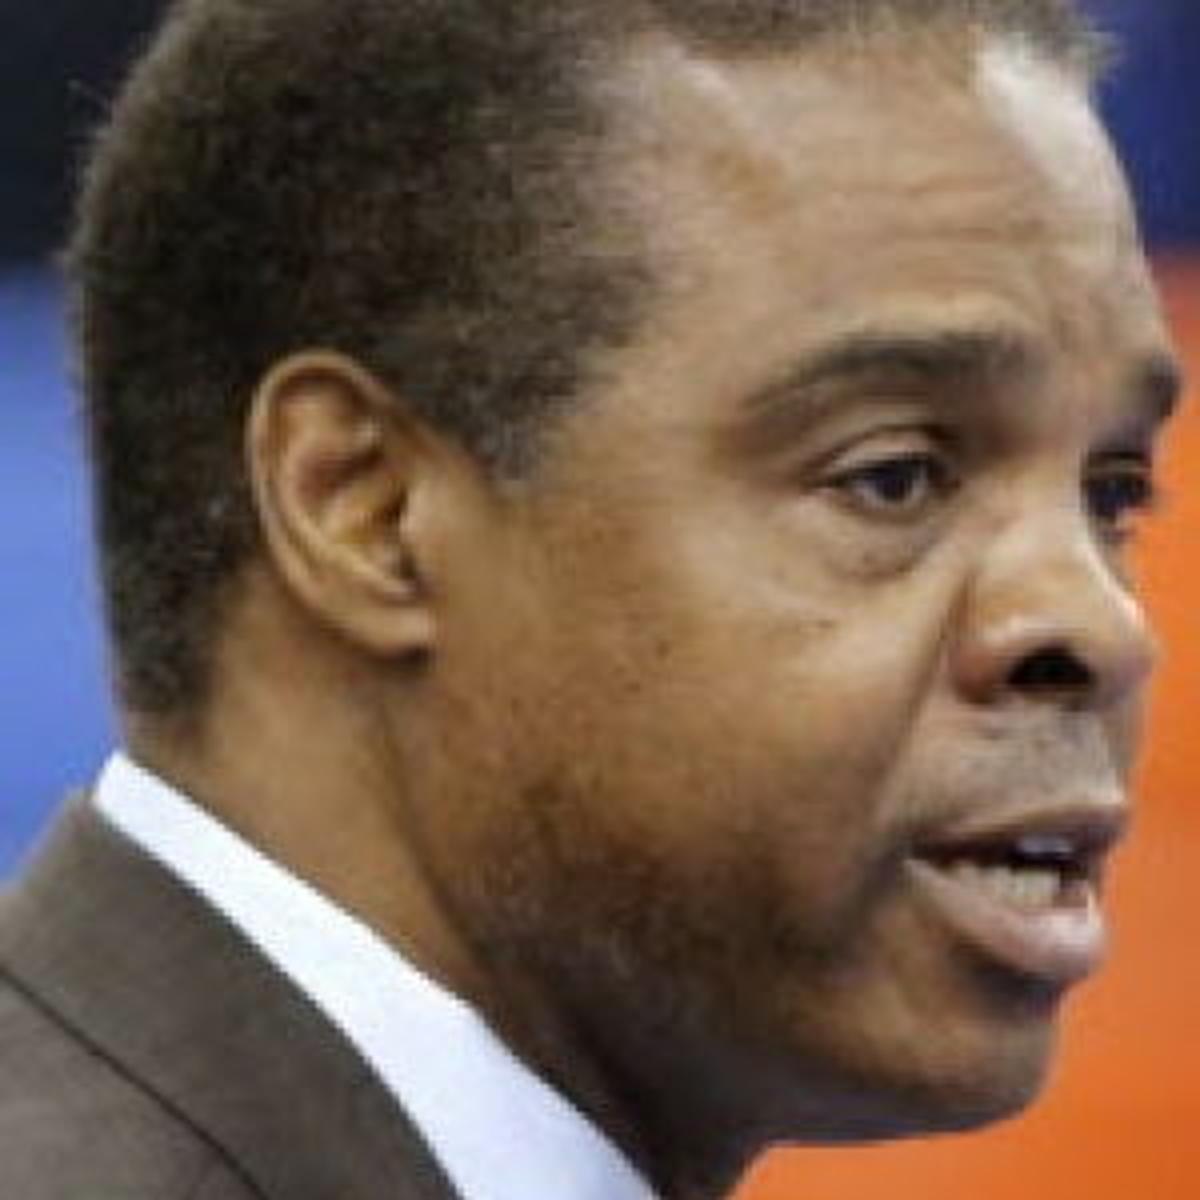 Williams: Hazing incidents weigh heavily on VSU   Columnist